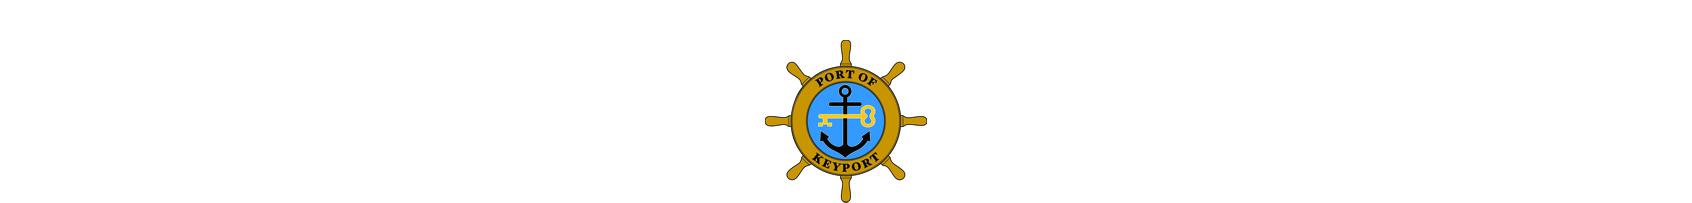 Port of Keyport logo